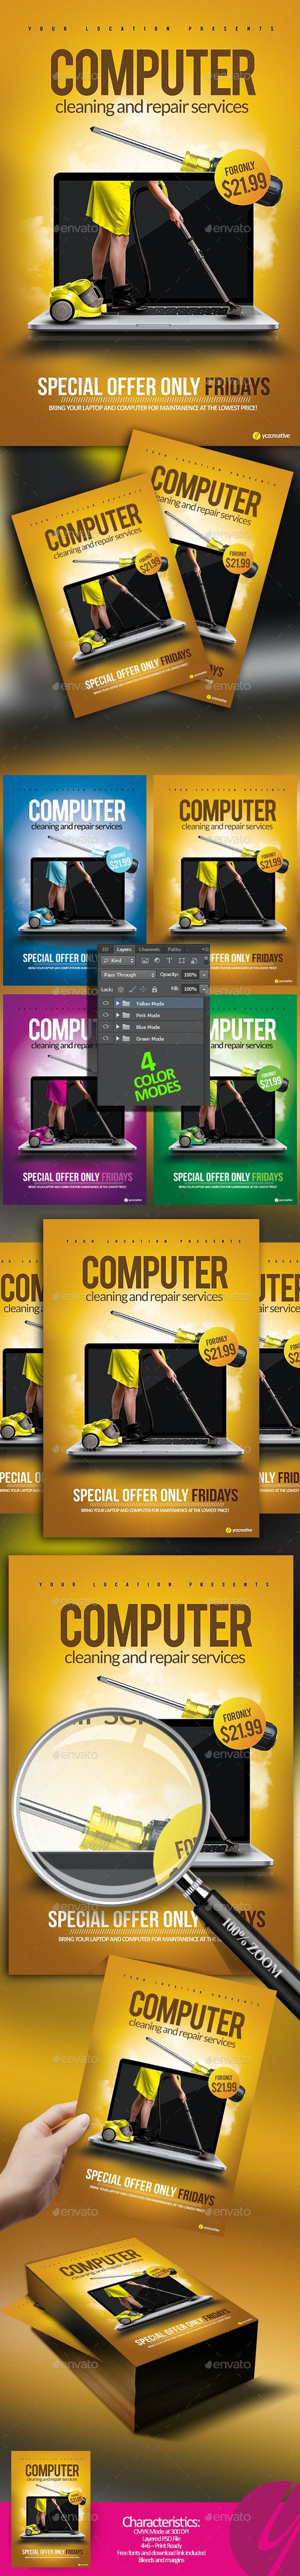 Computer Services Flyer - Miscellaneous Events